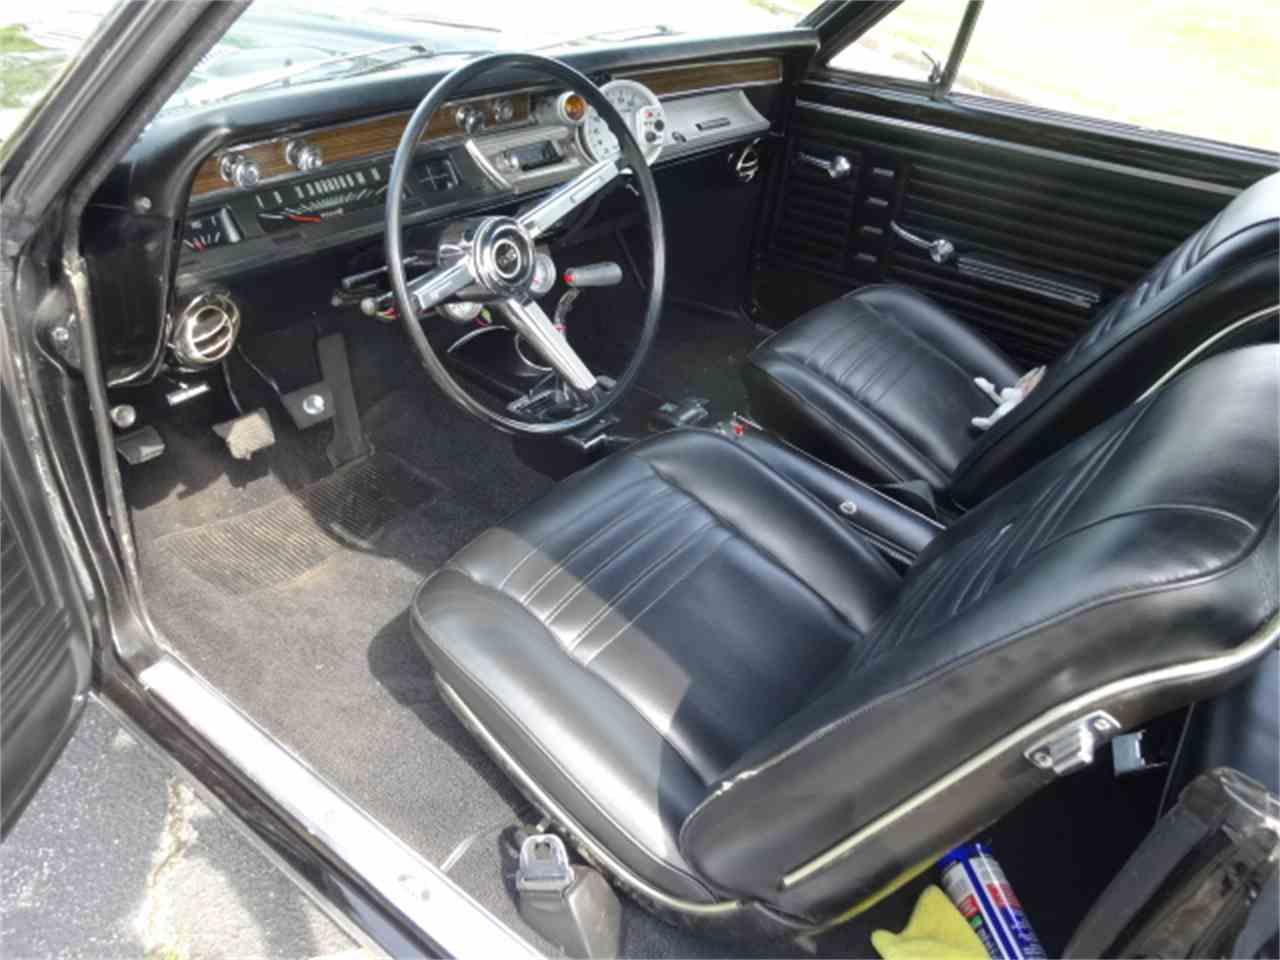 1967 Chevrolet Chevelle for Sale | ClassicCars.com | CC-998264